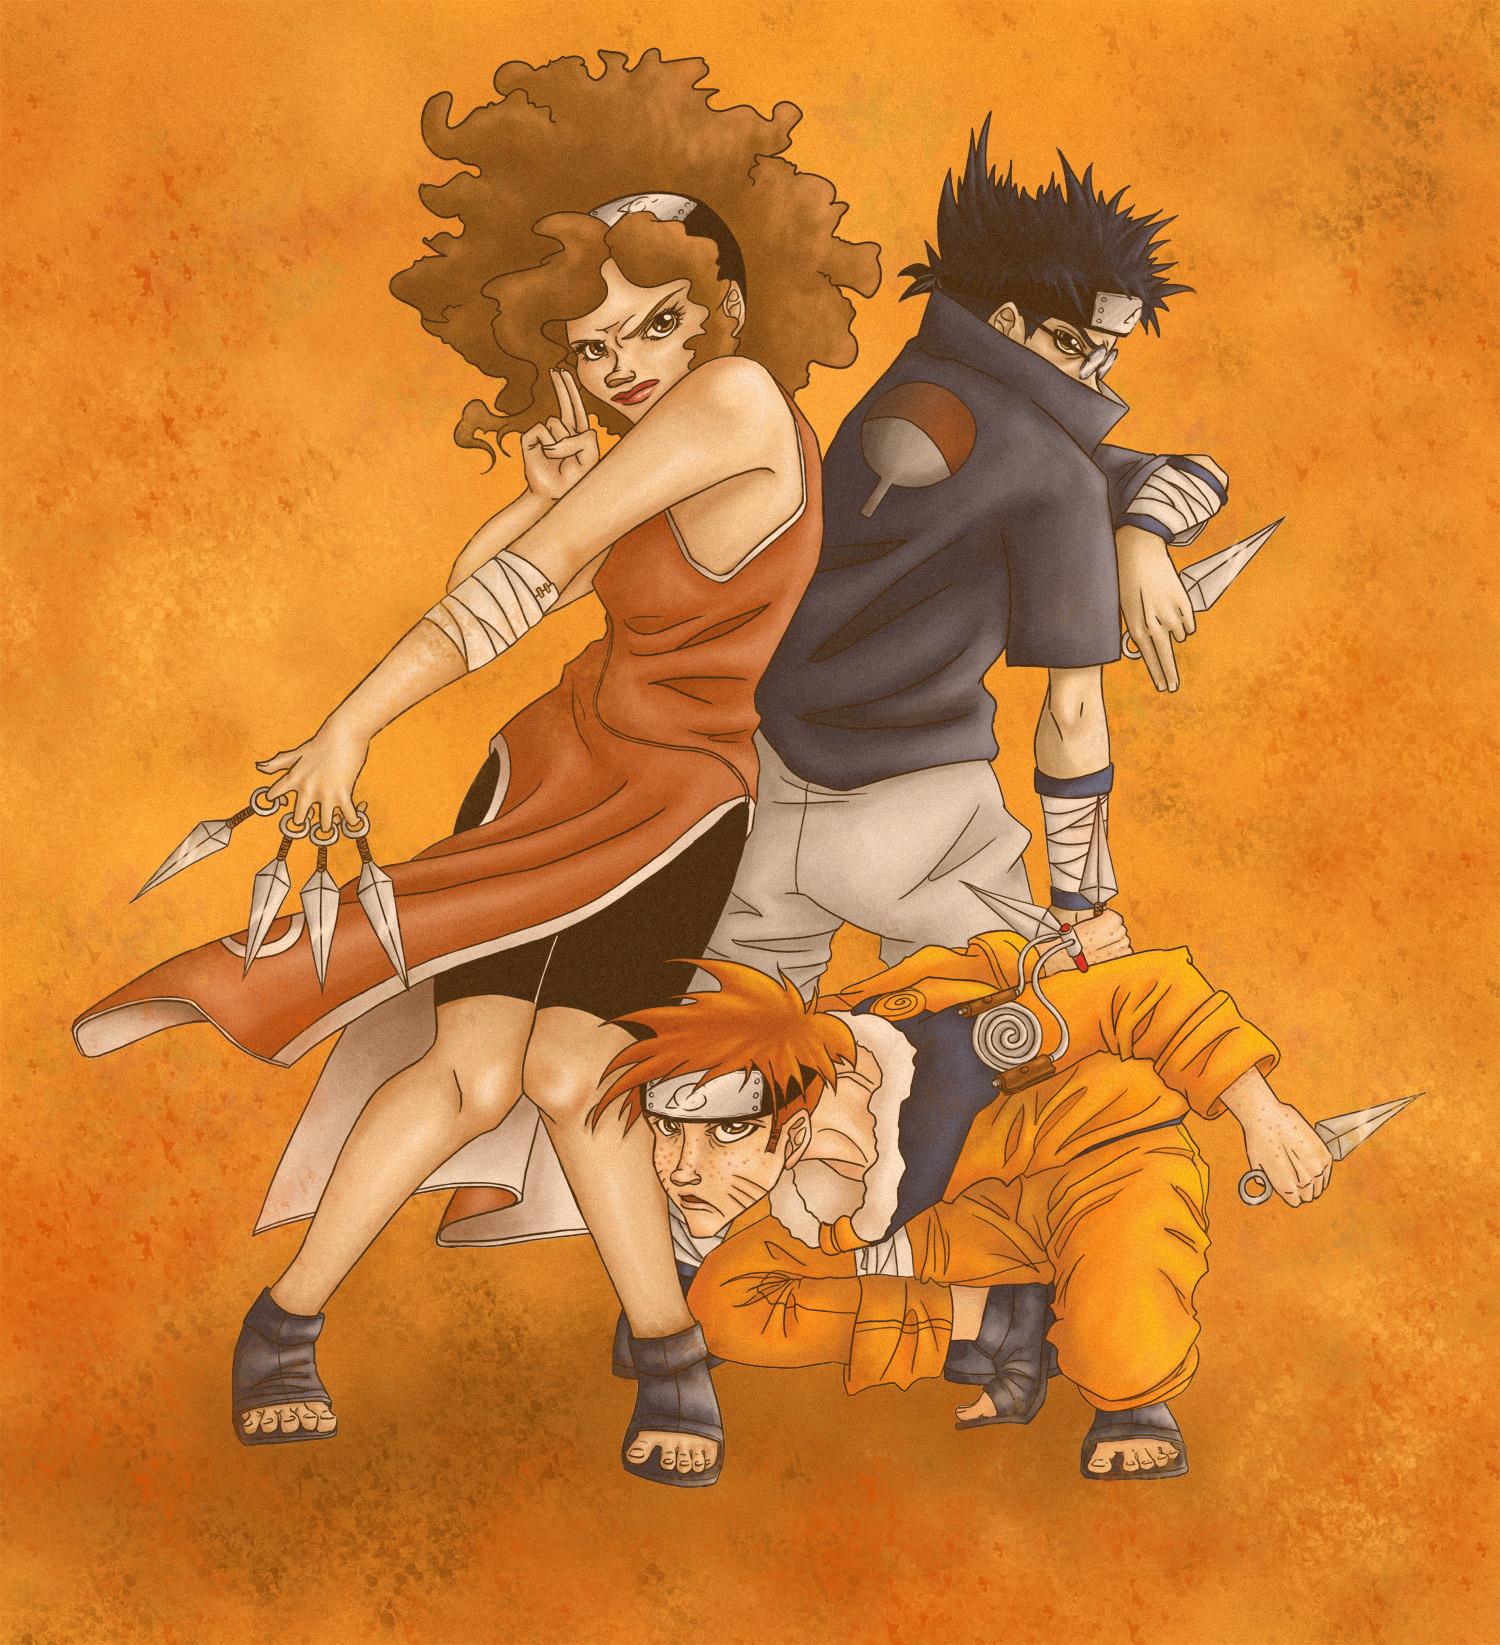 HP-Naruto crossover